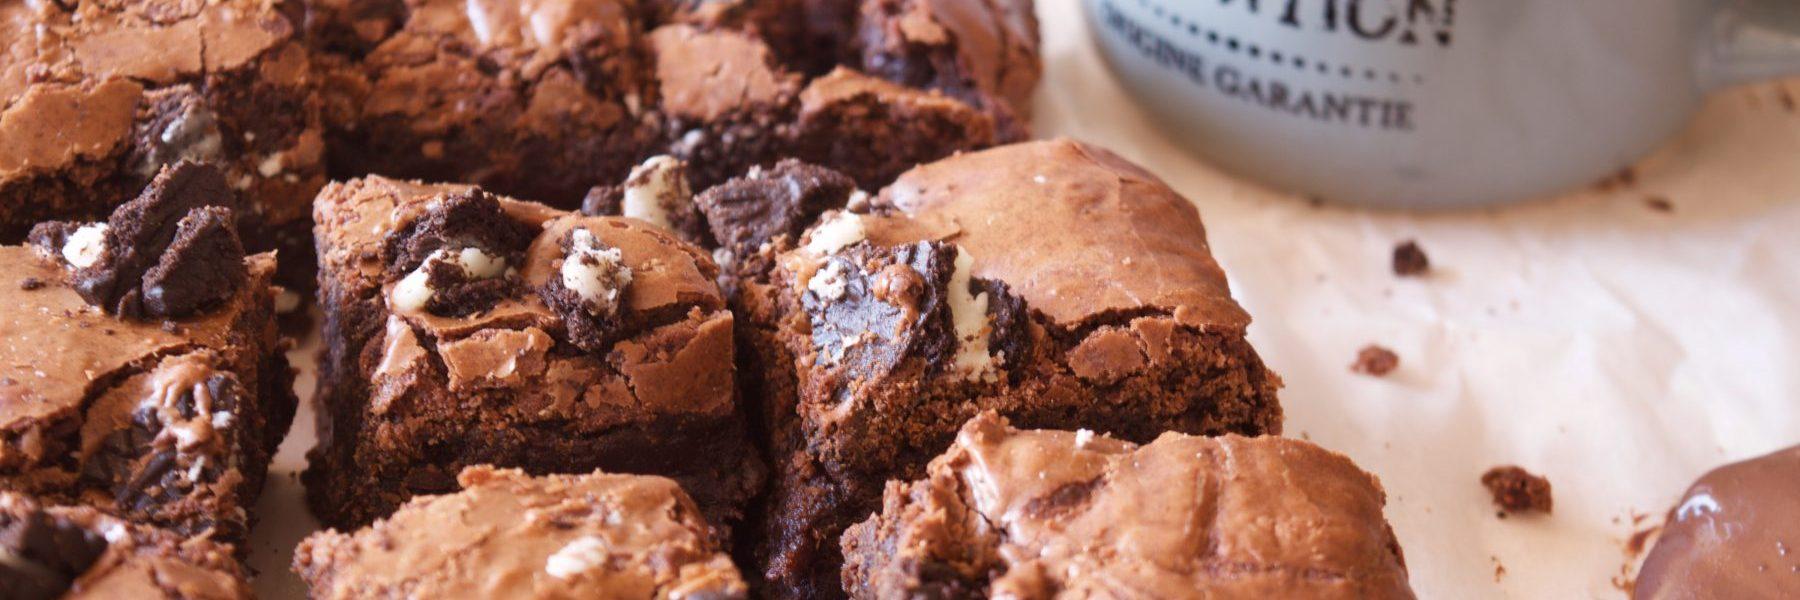 Brownie de chocholate & oreo